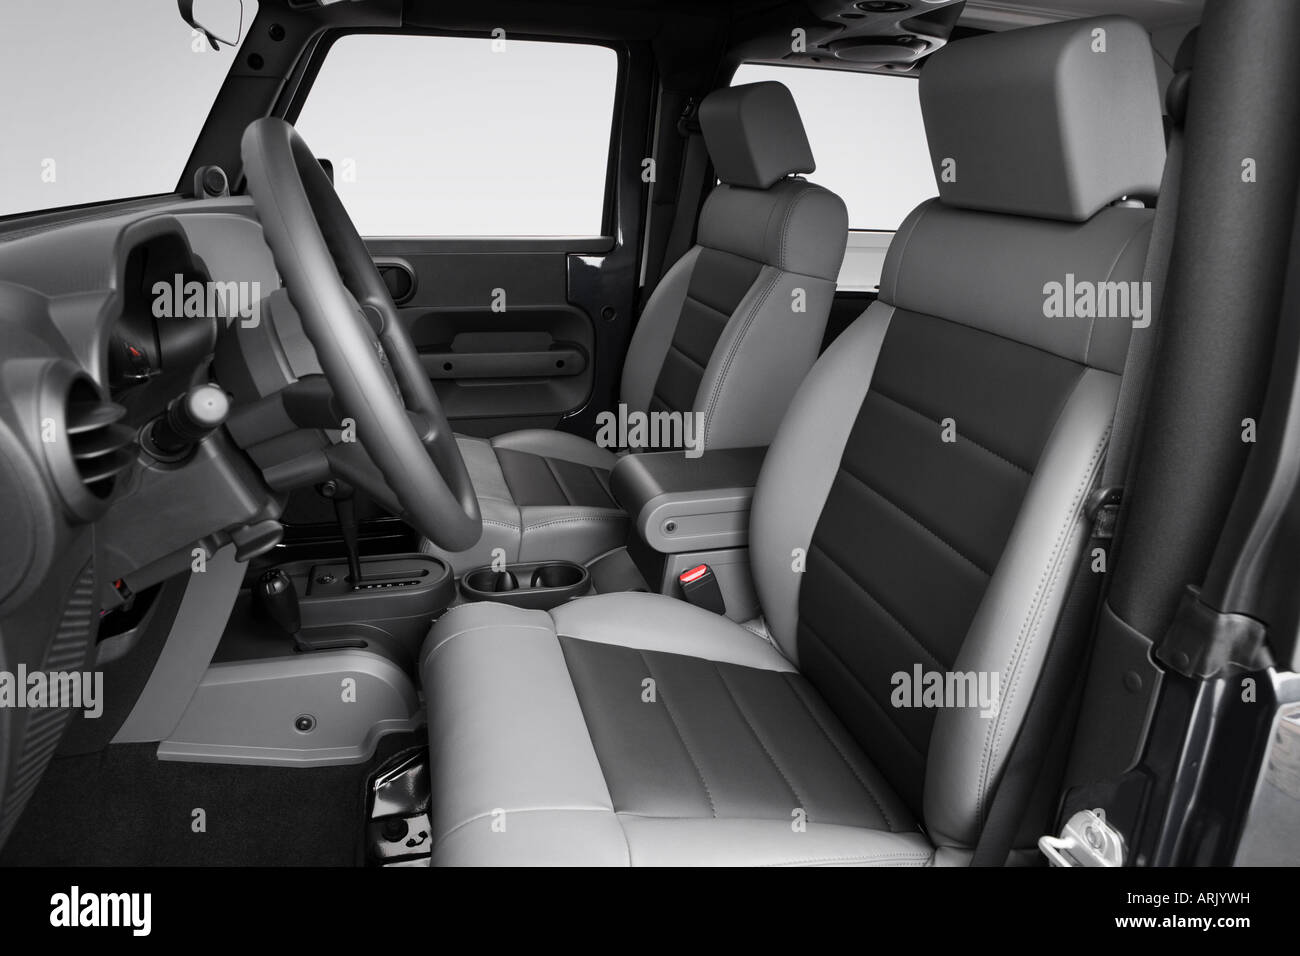 Jeep Wrangler Seats >> 2008 Jeep Wrangler X In Blue Front Seats Stock Photo